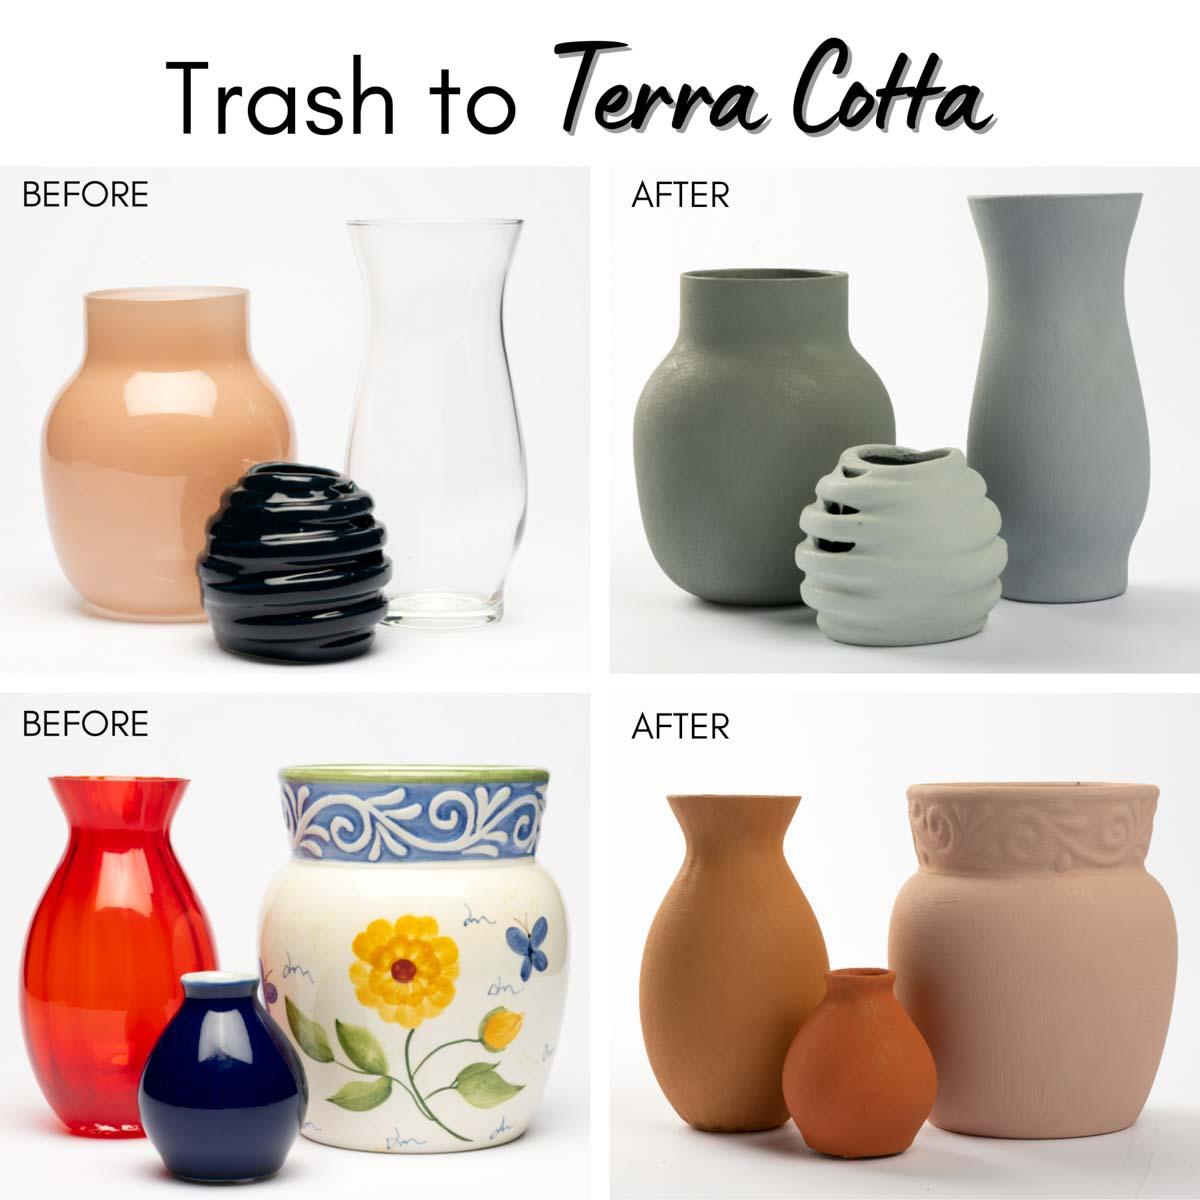 FolkArt ® Terra Cotta™ Acrylic Paint - Adobe White, 2 oz. - 7012